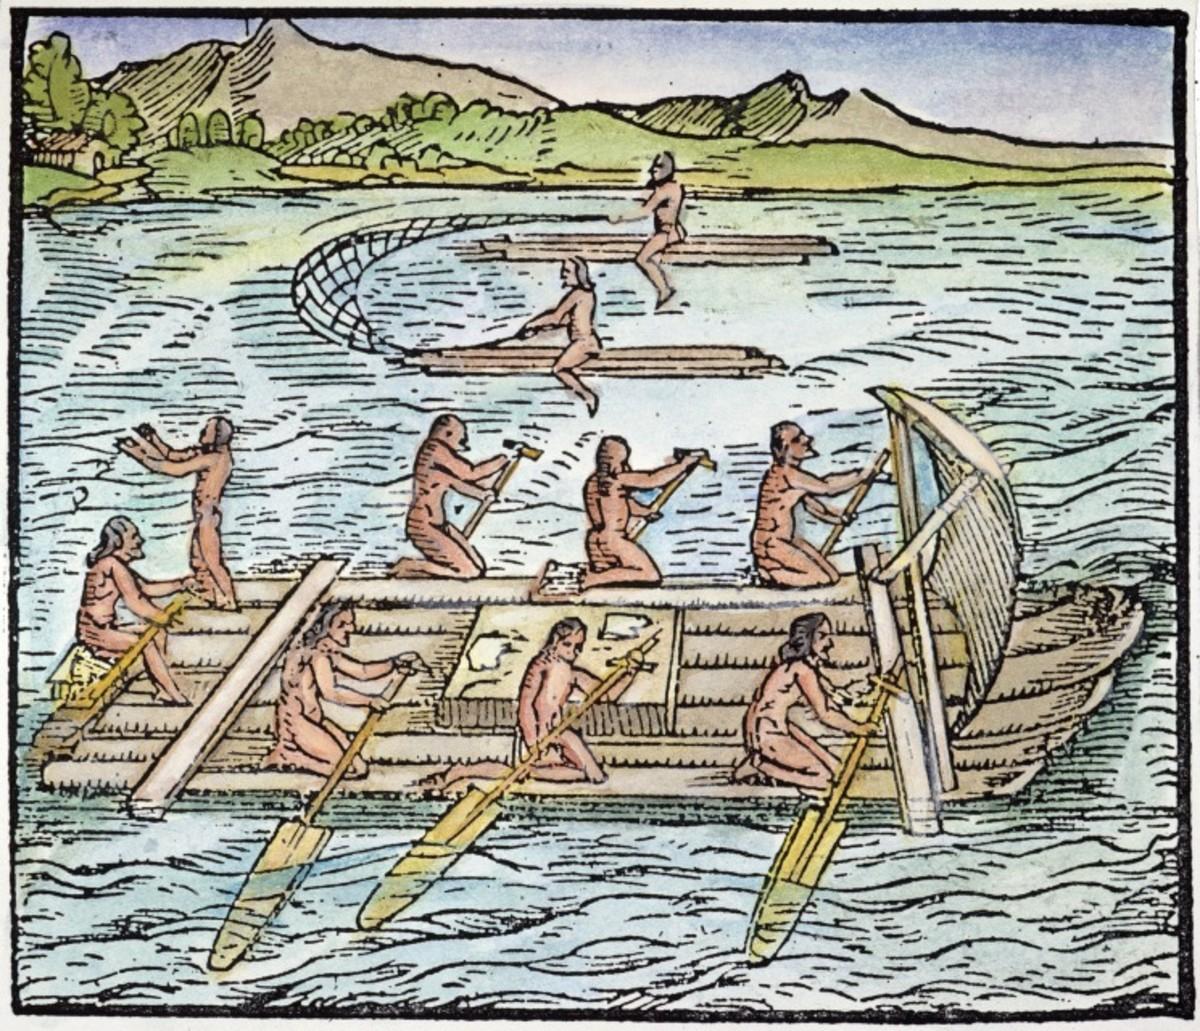 Tainos go boating.